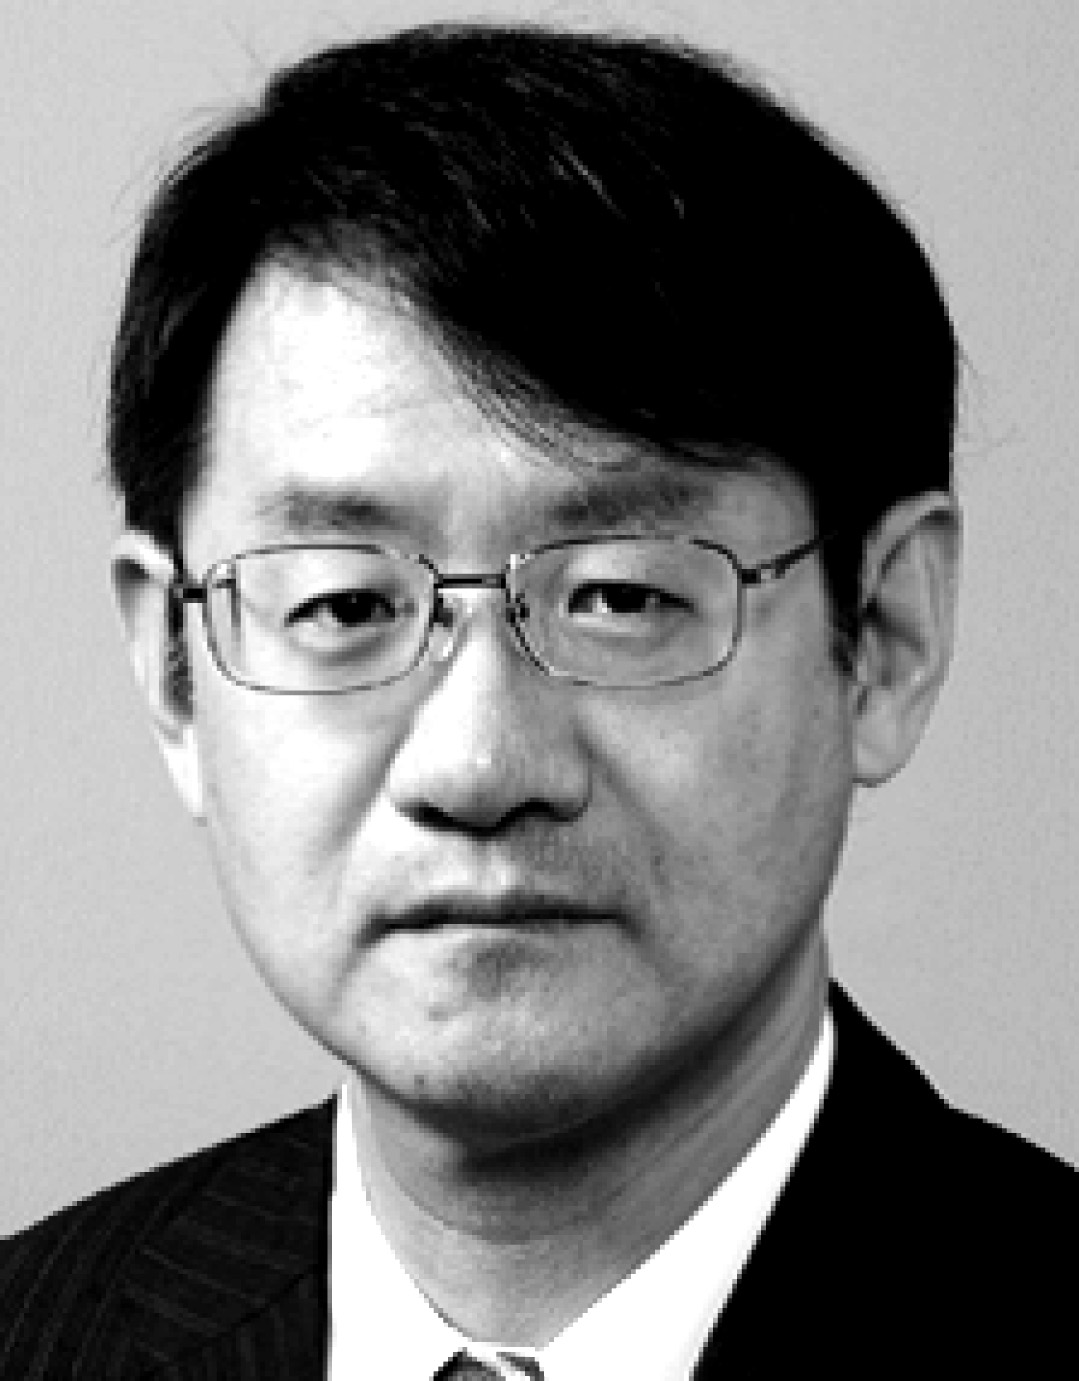 Mitsuishi Mamoru